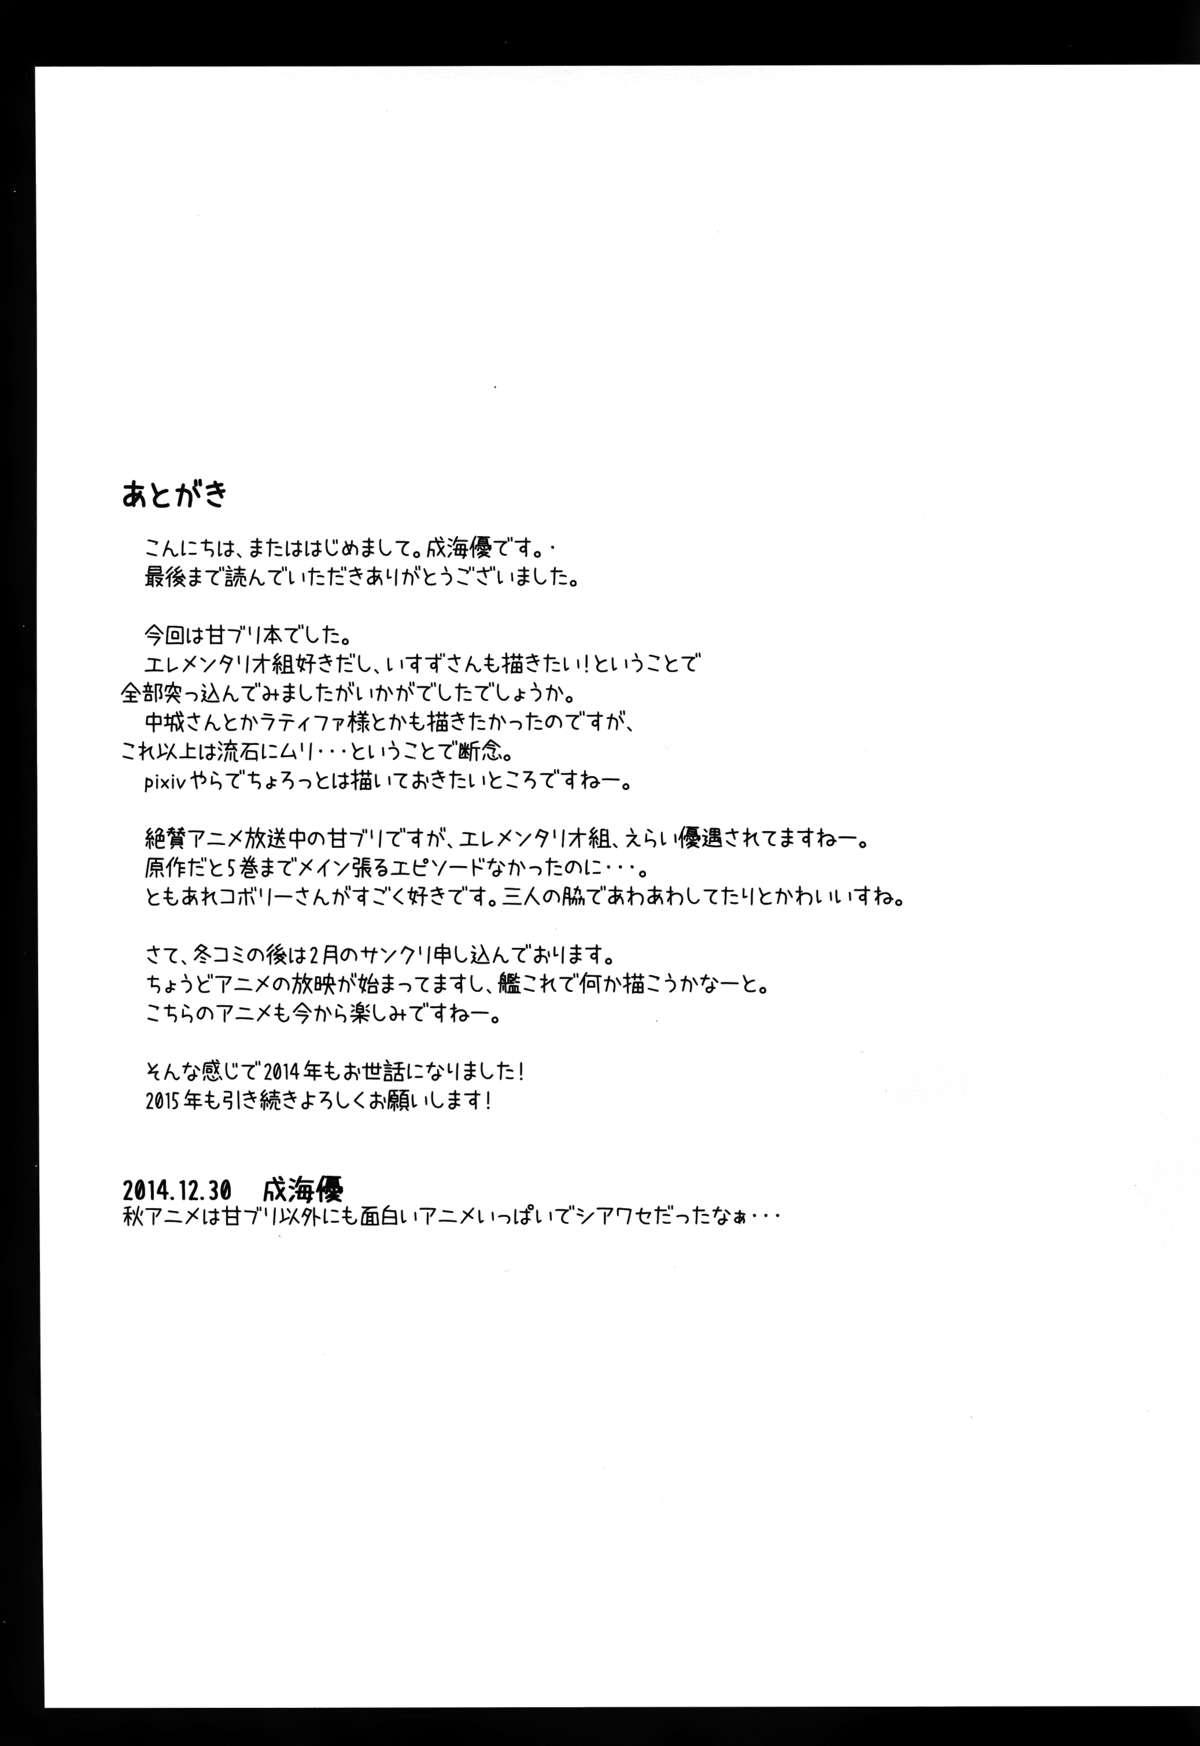 Masani Risoukyou - Sou, Koko wa Elementario 20